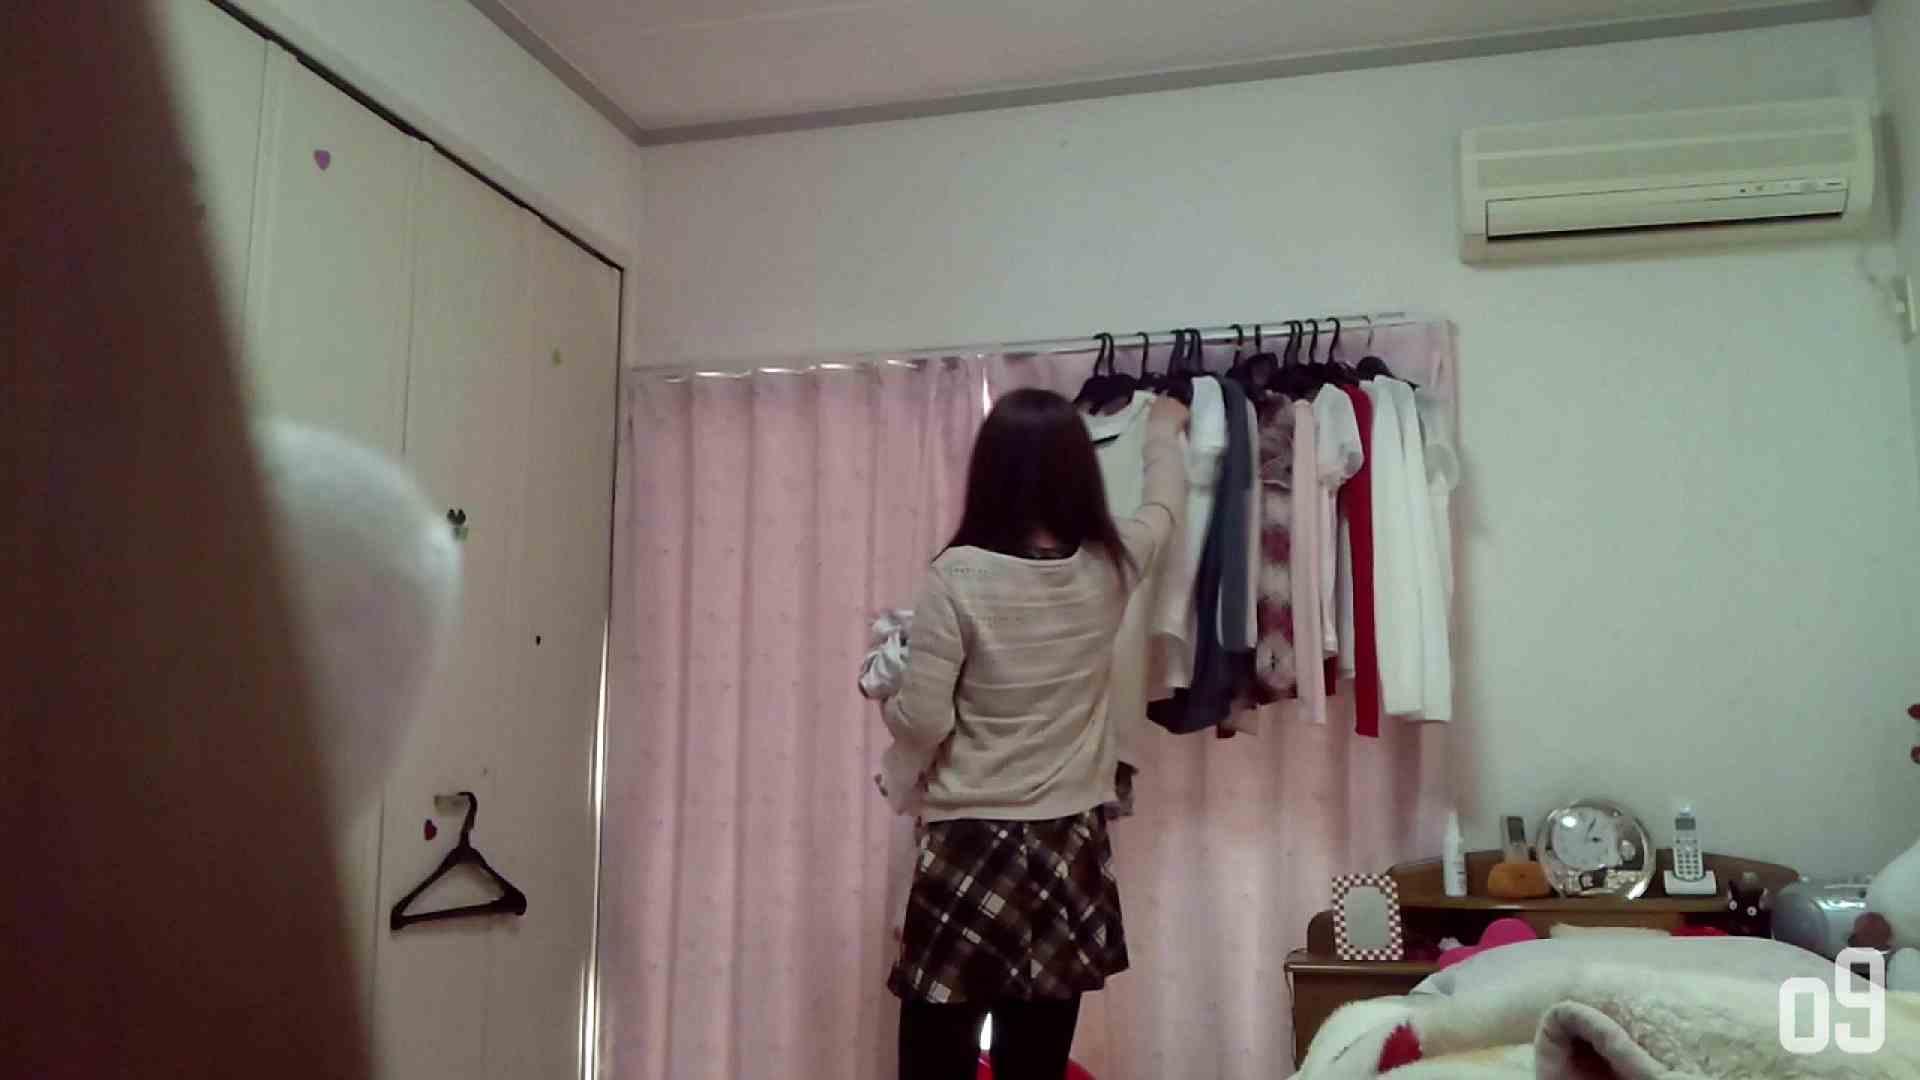 vol.2 瑞希ちゃんの自宅公開!寝起きの着替え・・・ラリルそー 美女OL  44連発 42